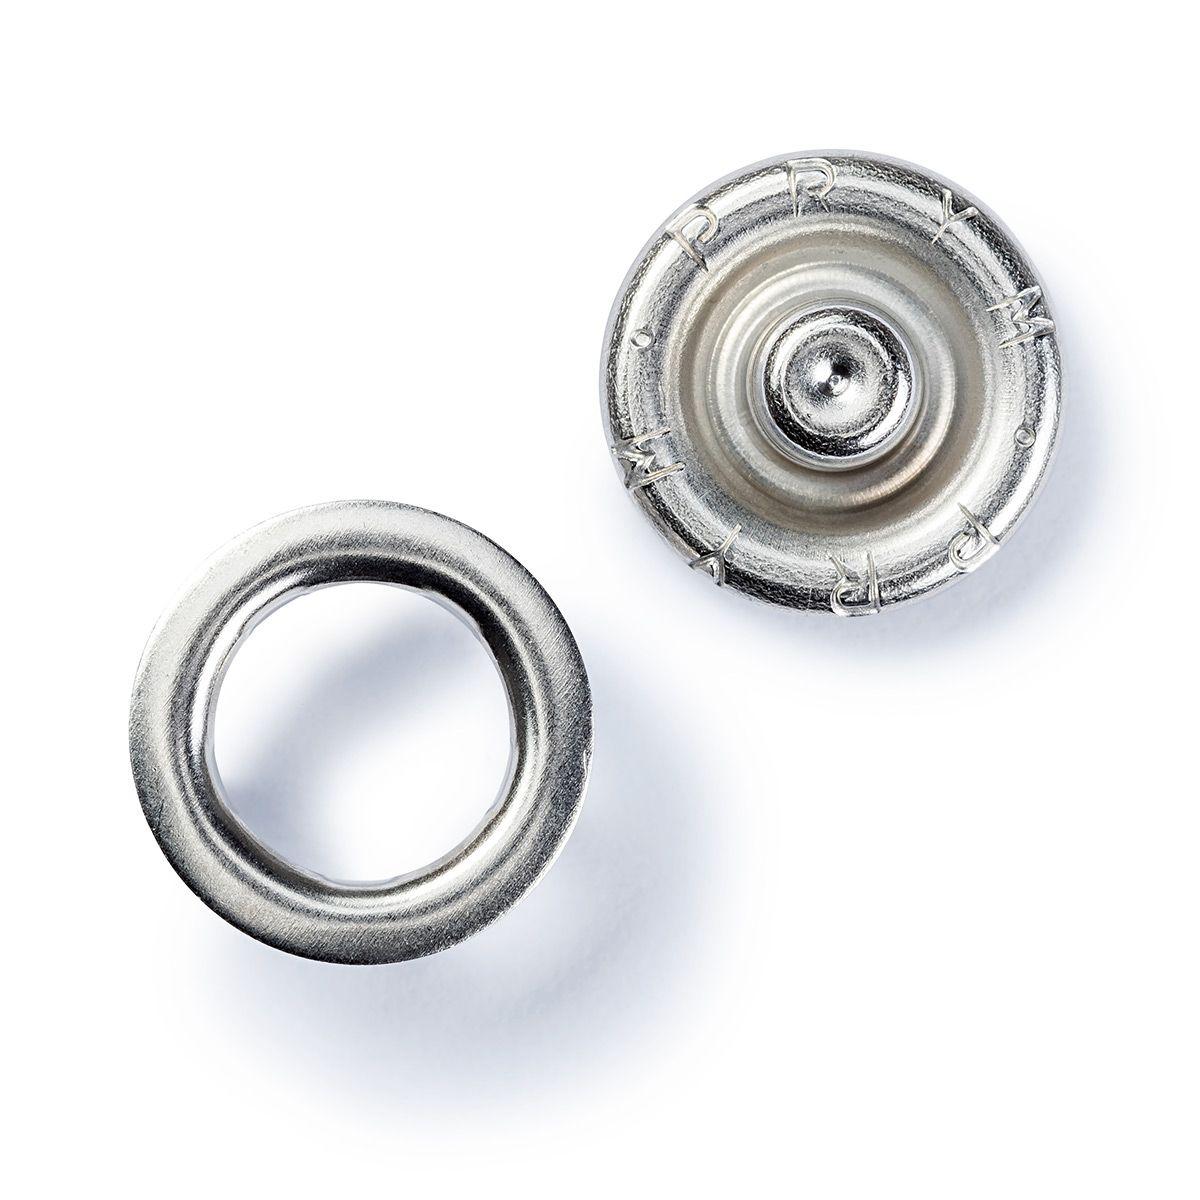 Boutons pression jersey Argent avec outil 10 mm